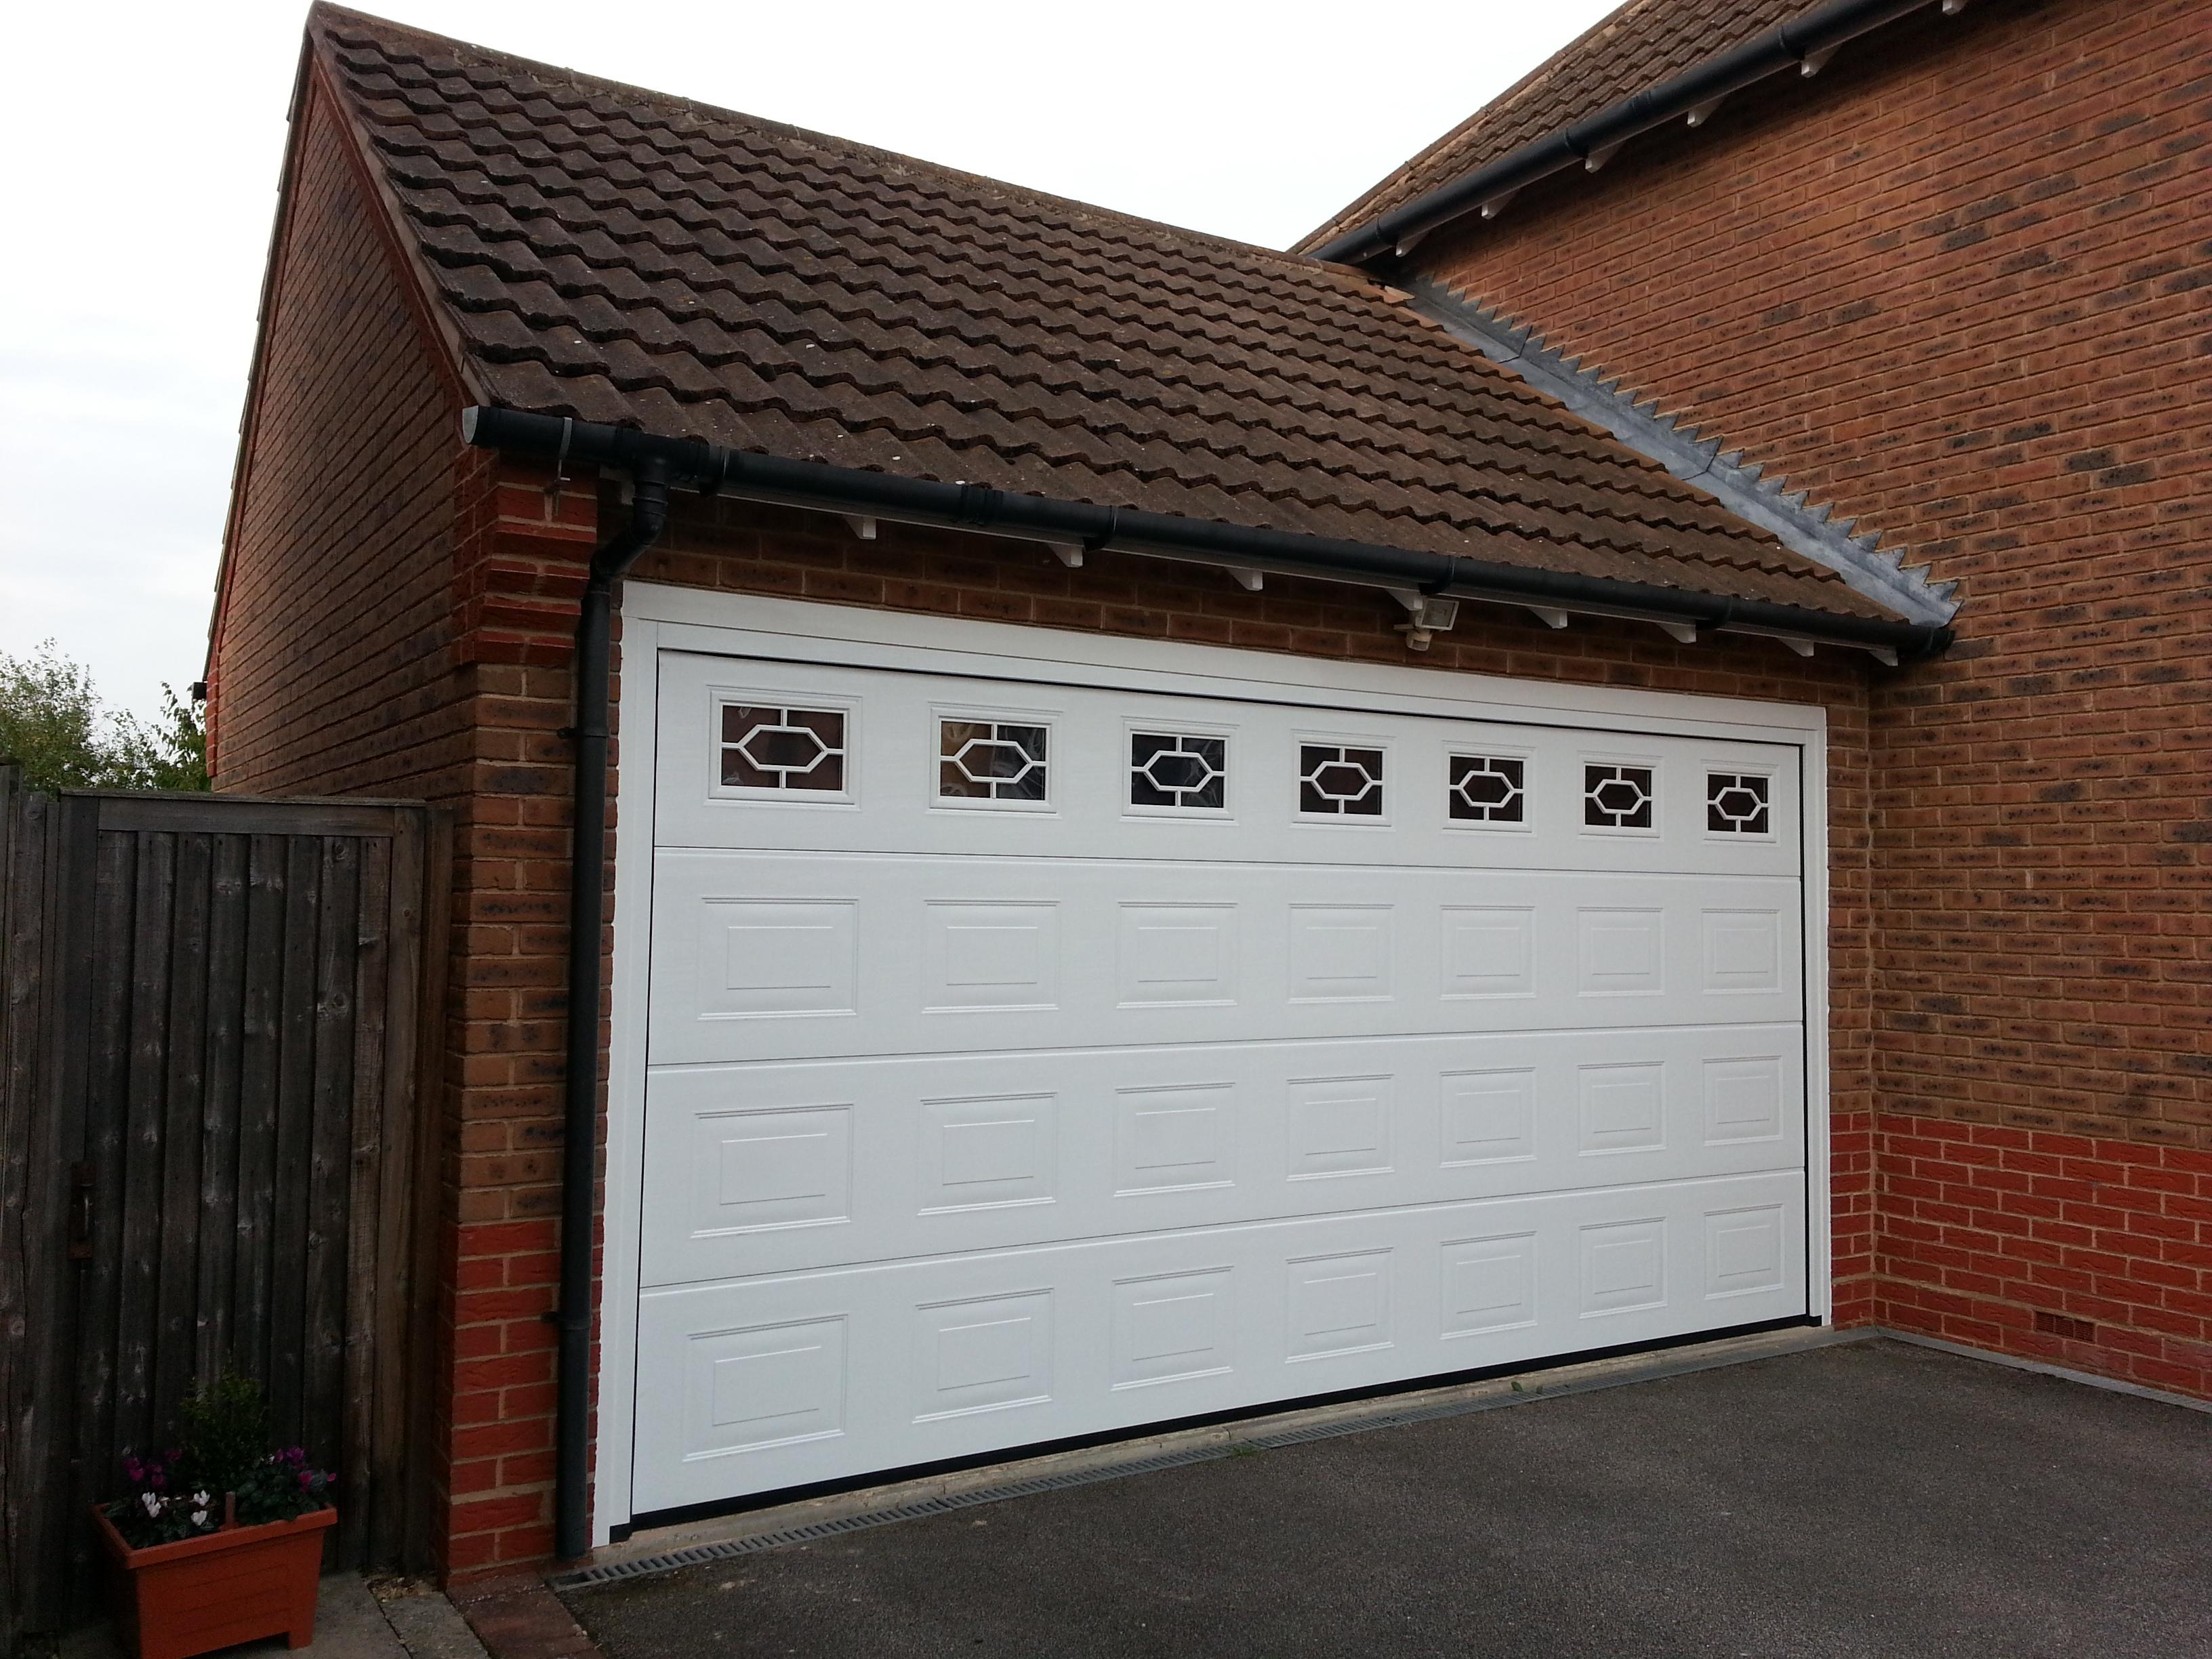 2448 #67402F  Door Stamford – Automatic Sectional Garador – Garage Door Company image Garage Doors Company 35833264